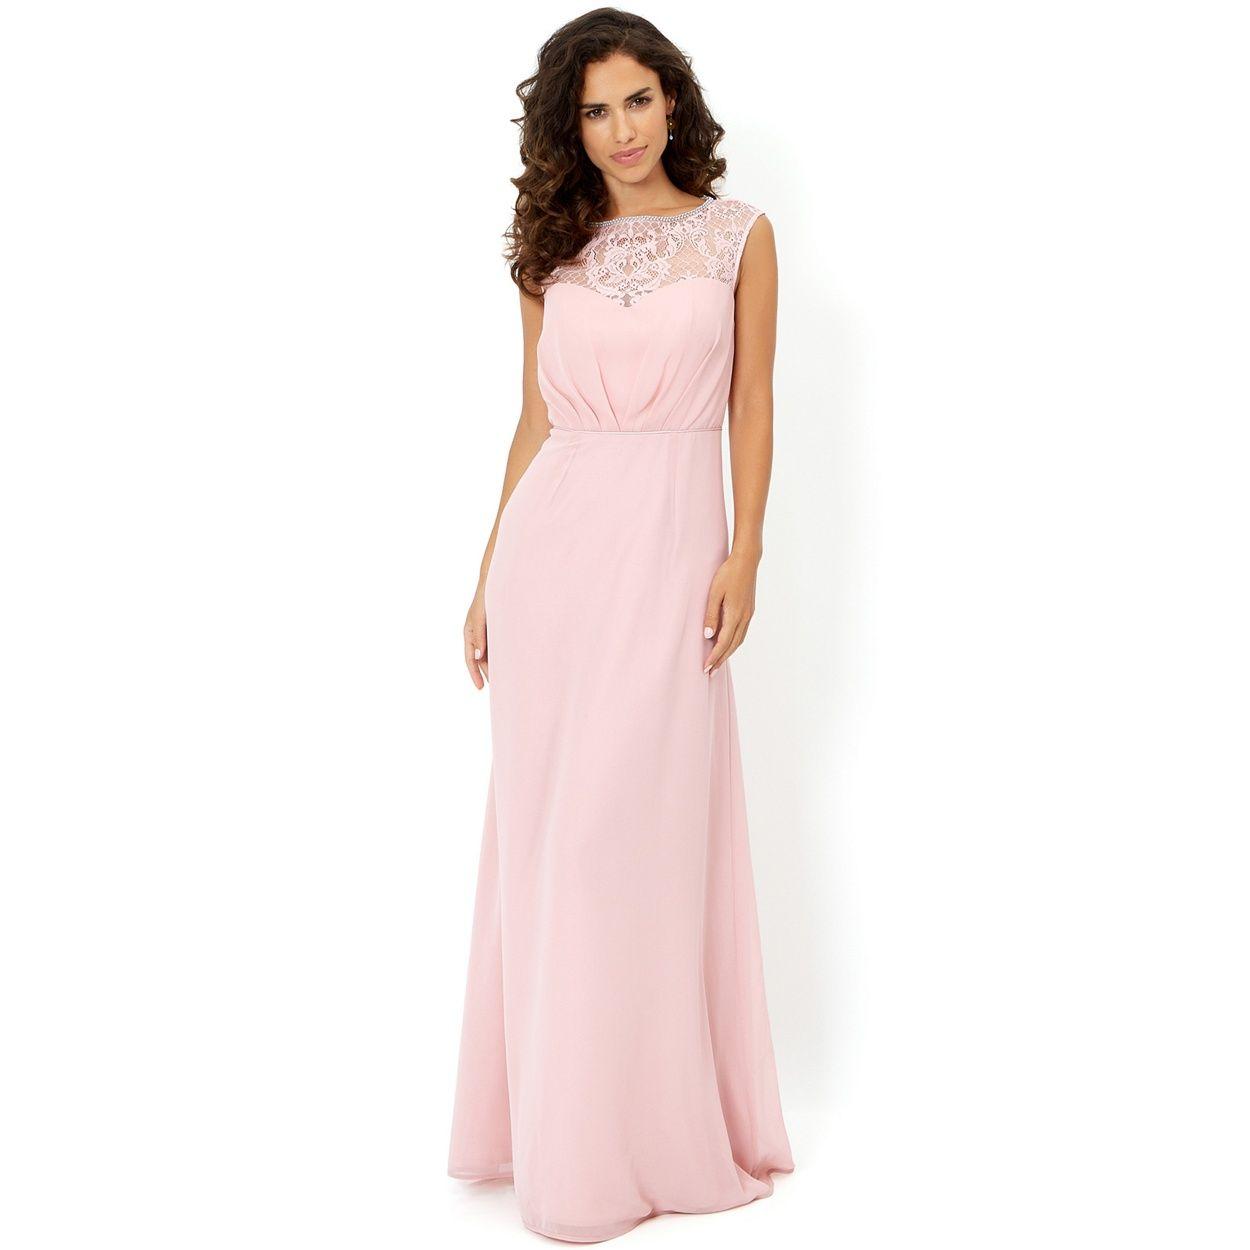 Monsoon pink maisie maxi dress debenhams bridesmaid dresses monsoon pink maisie maxi dress debenhams ombrellifo Choice Image